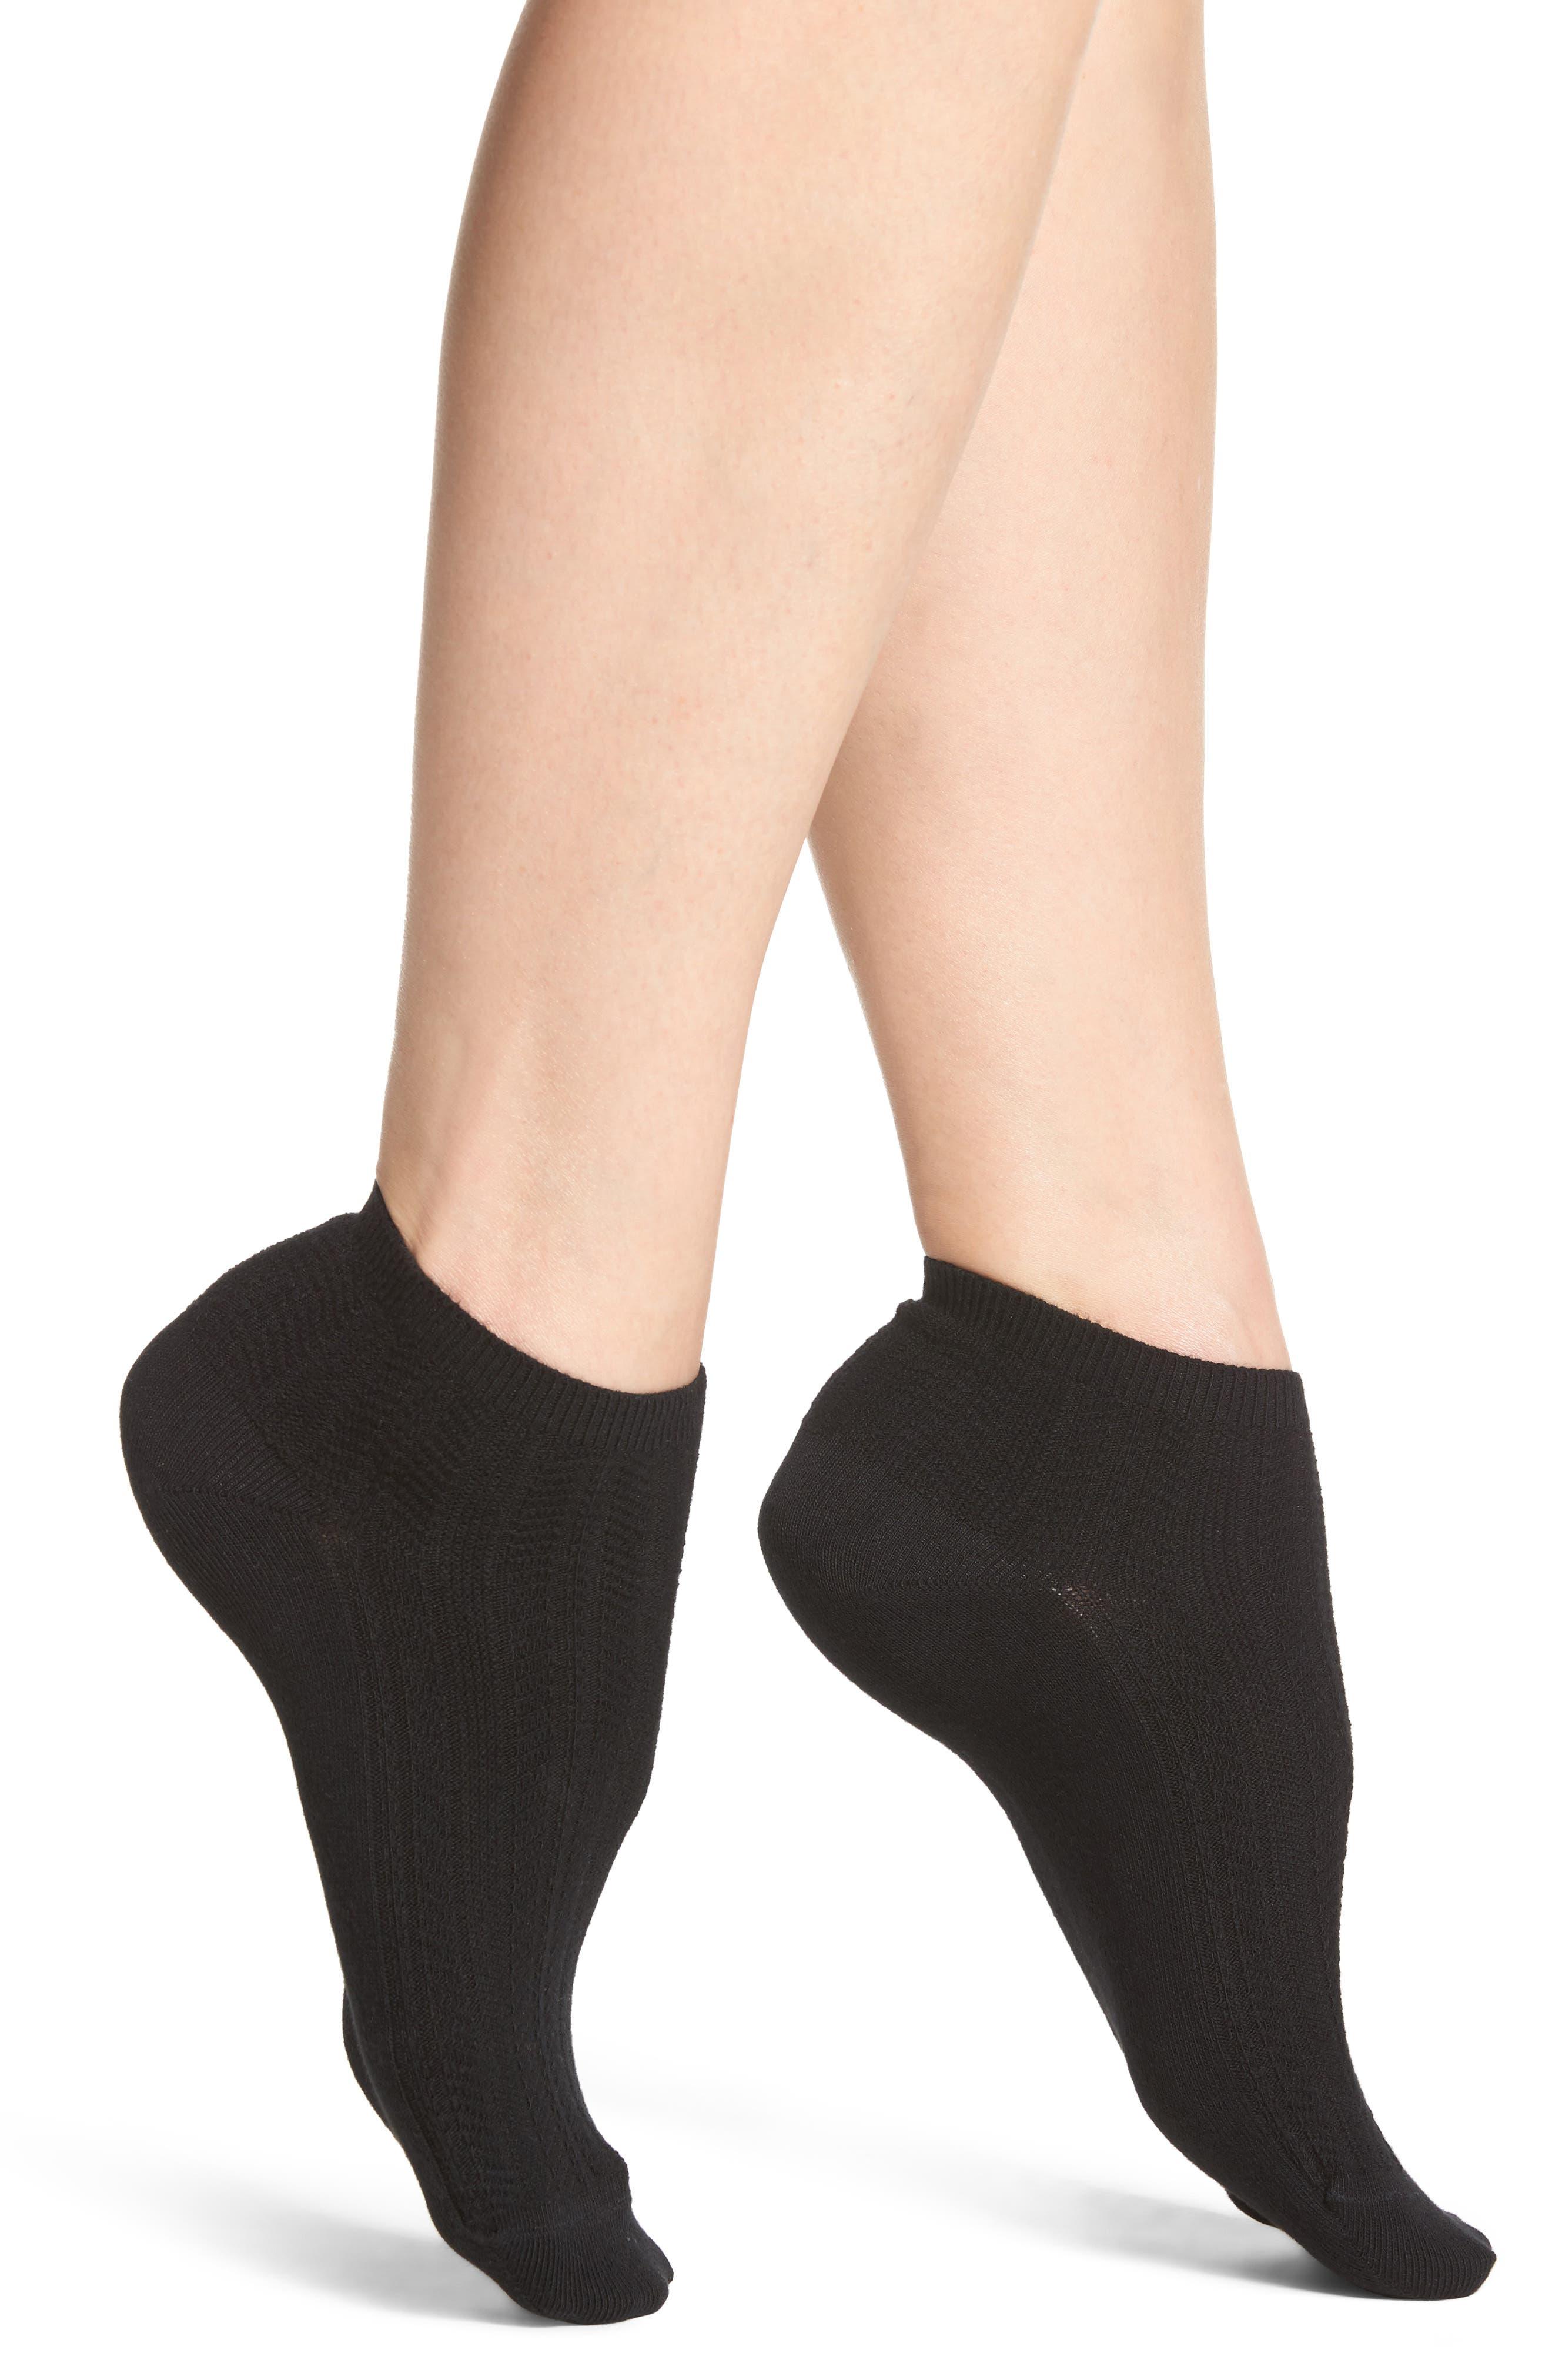 Knit Ankle Socks,                             Main thumbnail 1, color,                             001